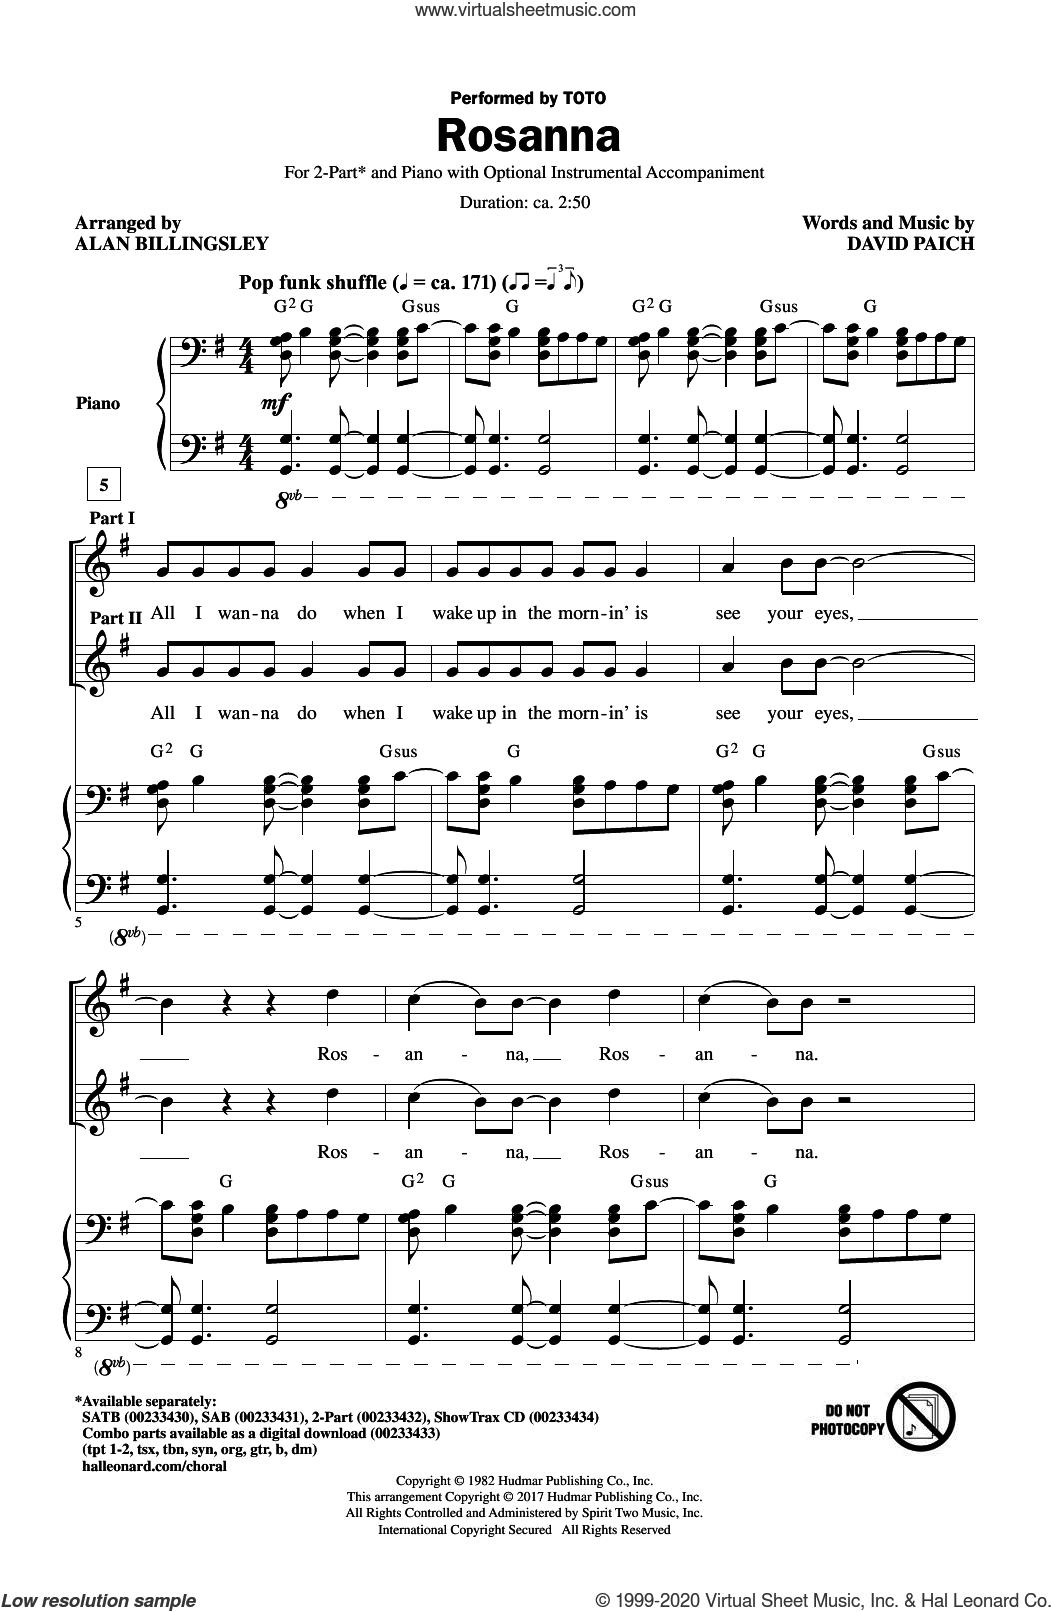 Rosanna (arr. Alan Billingsley) sheet music for choir (2-Part) by Alan Billingsley, Toto and David Paich, intermediate duet